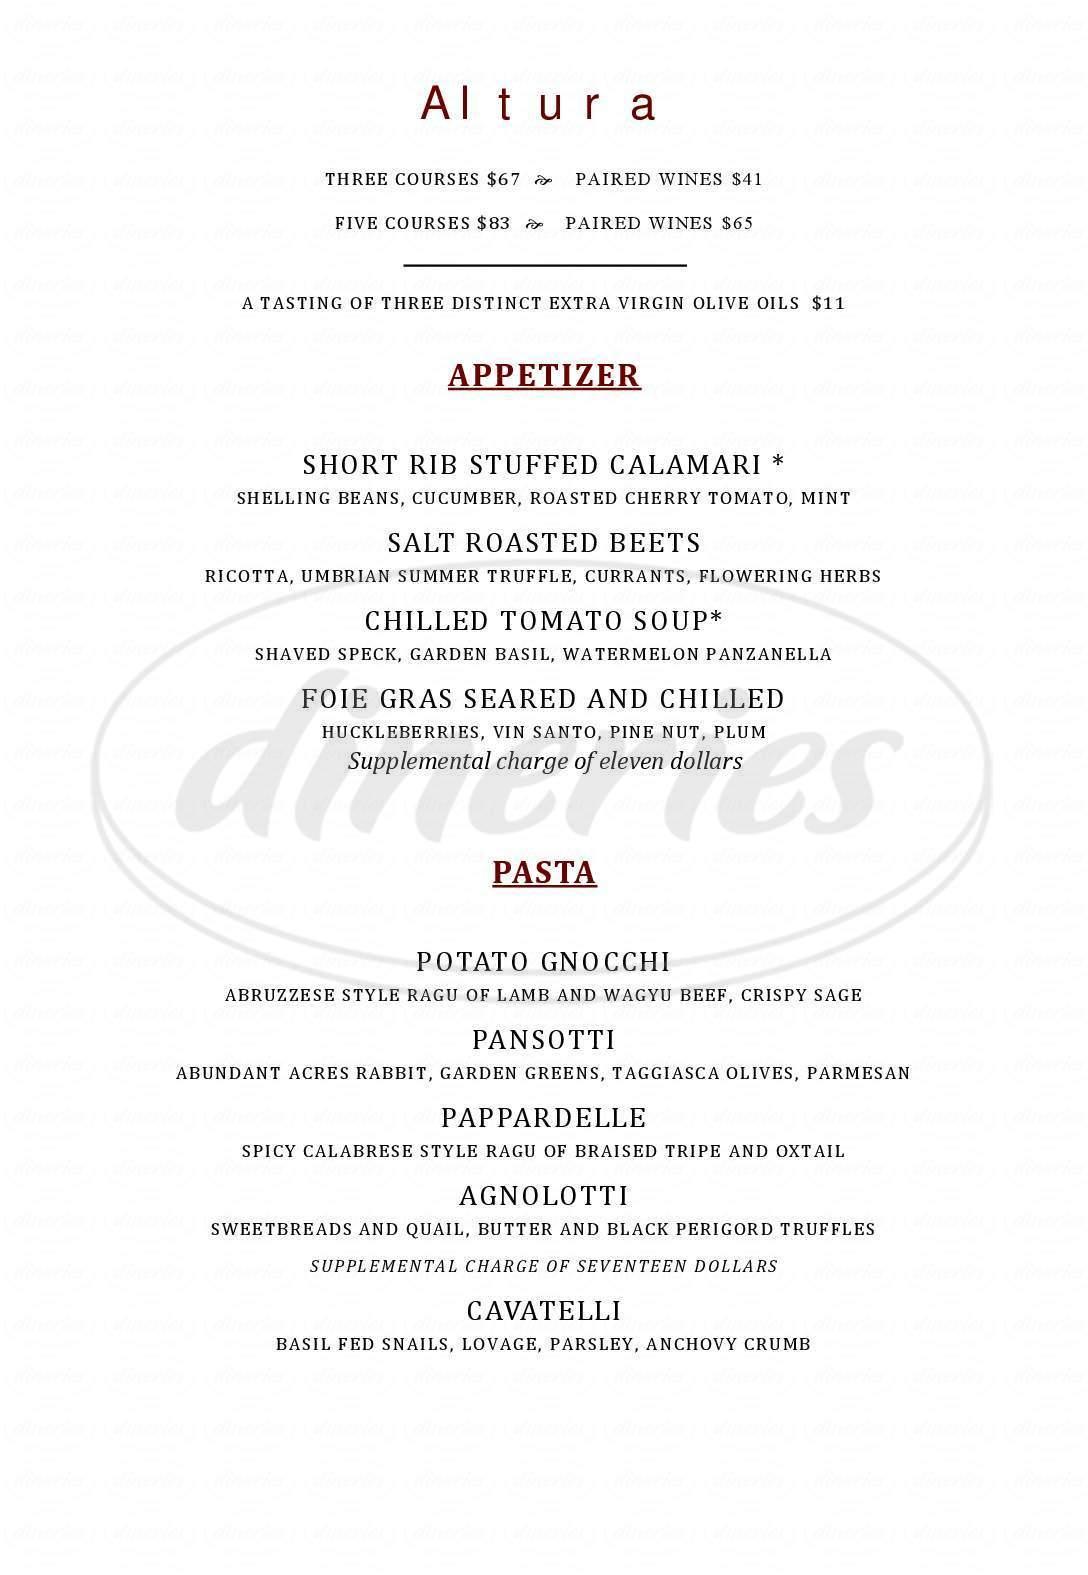 menu for Altura